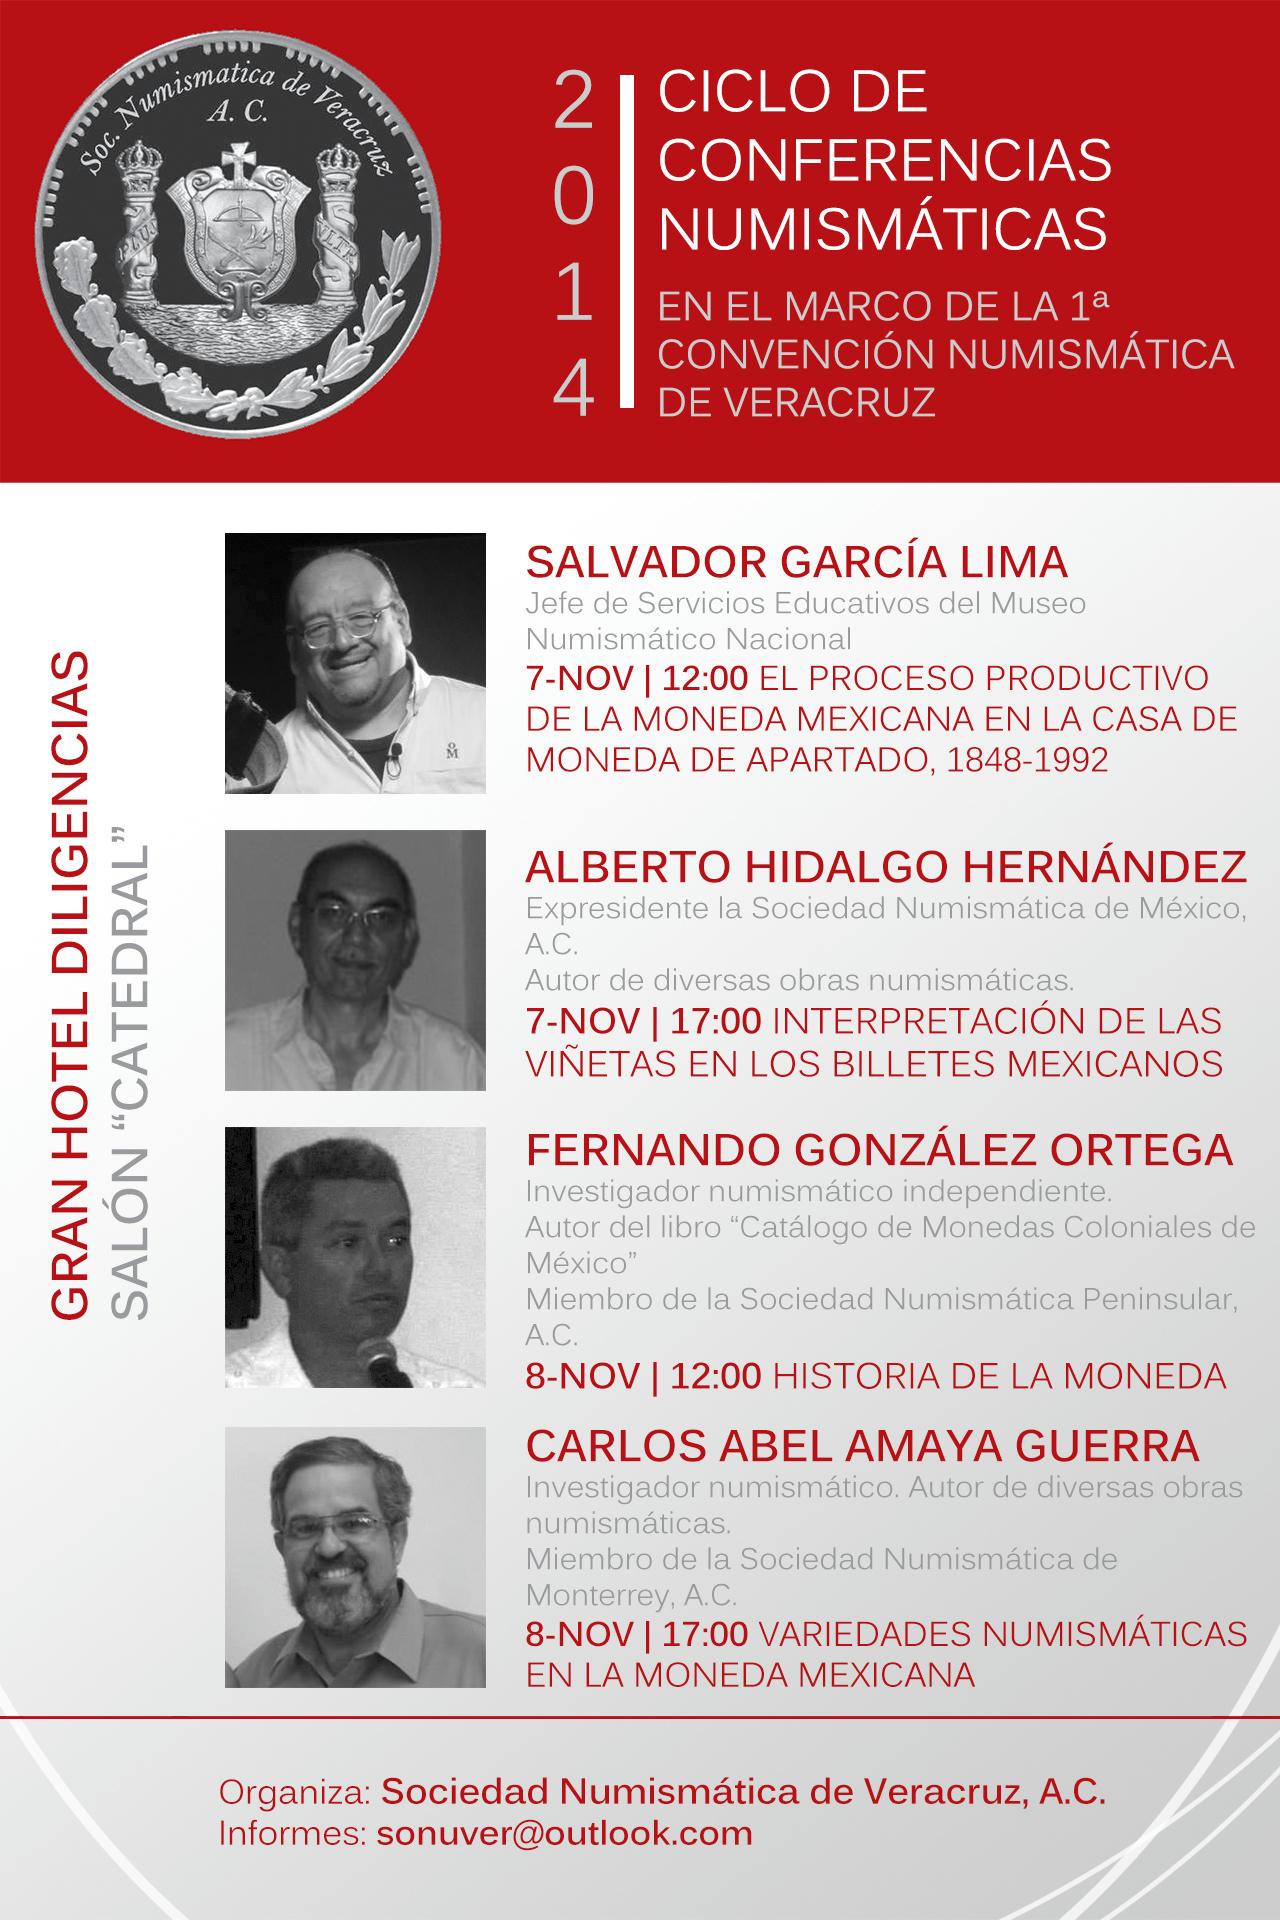 I Convención Numismática de Veracruz (México) Cwqkxvp8mp48j97fg